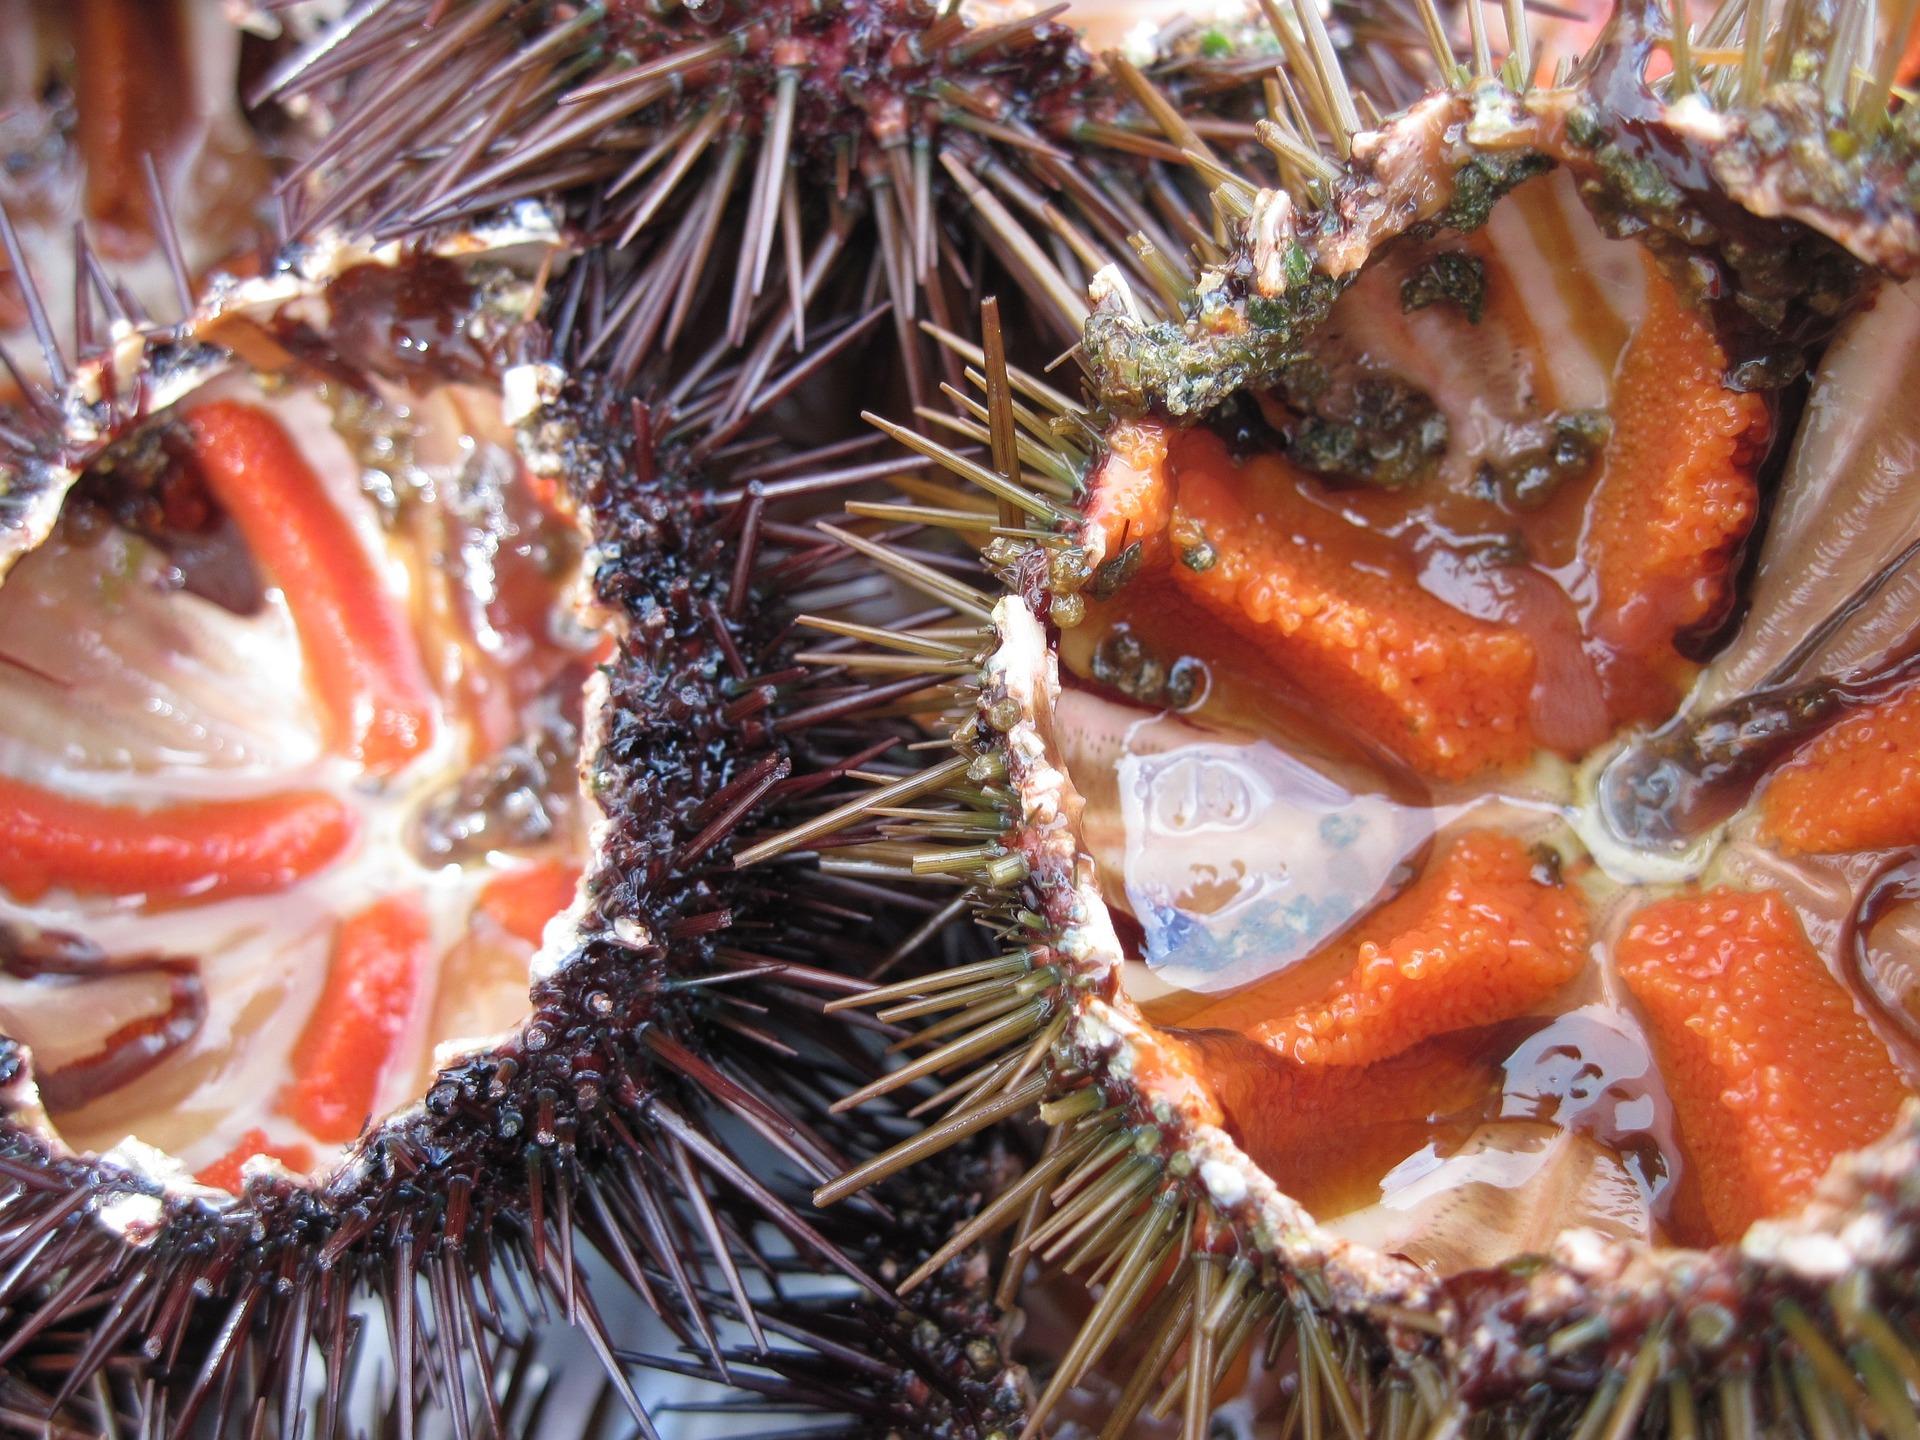 sea-urchins-1177788_1920.jpg